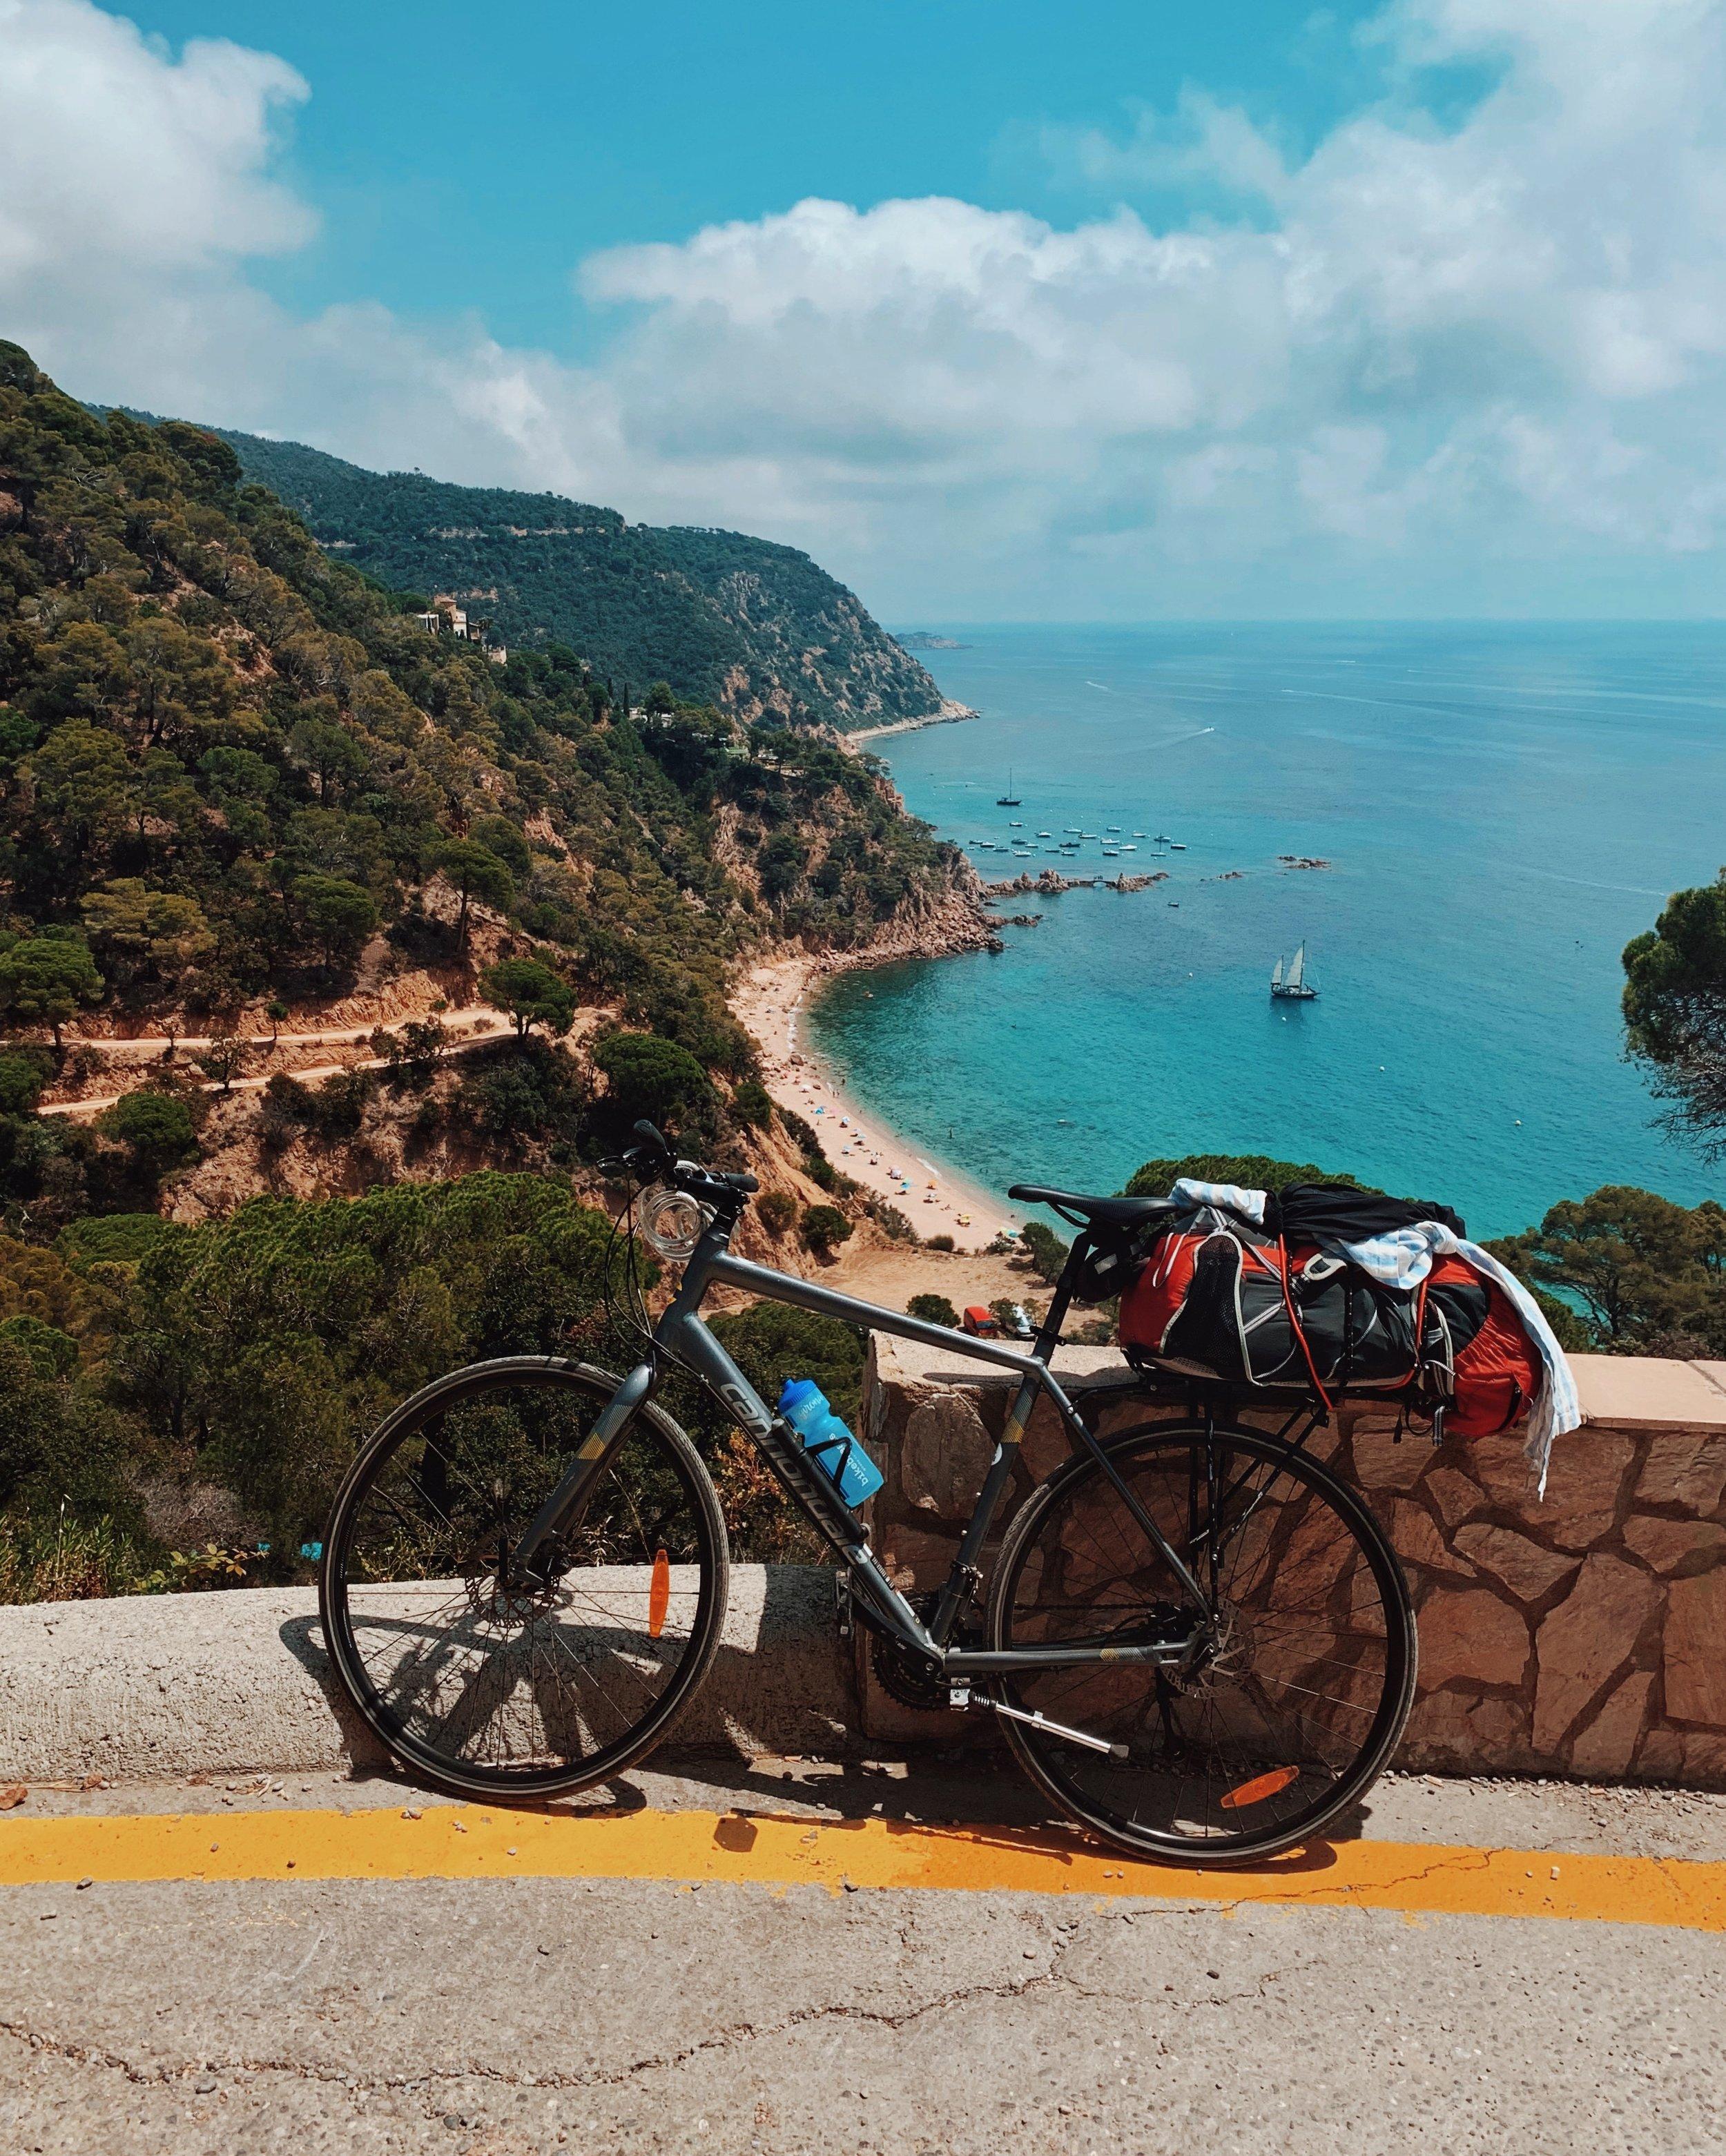 My bike setup above Cala del Senyor Ramon in between Tossa de Mar and Llafranc